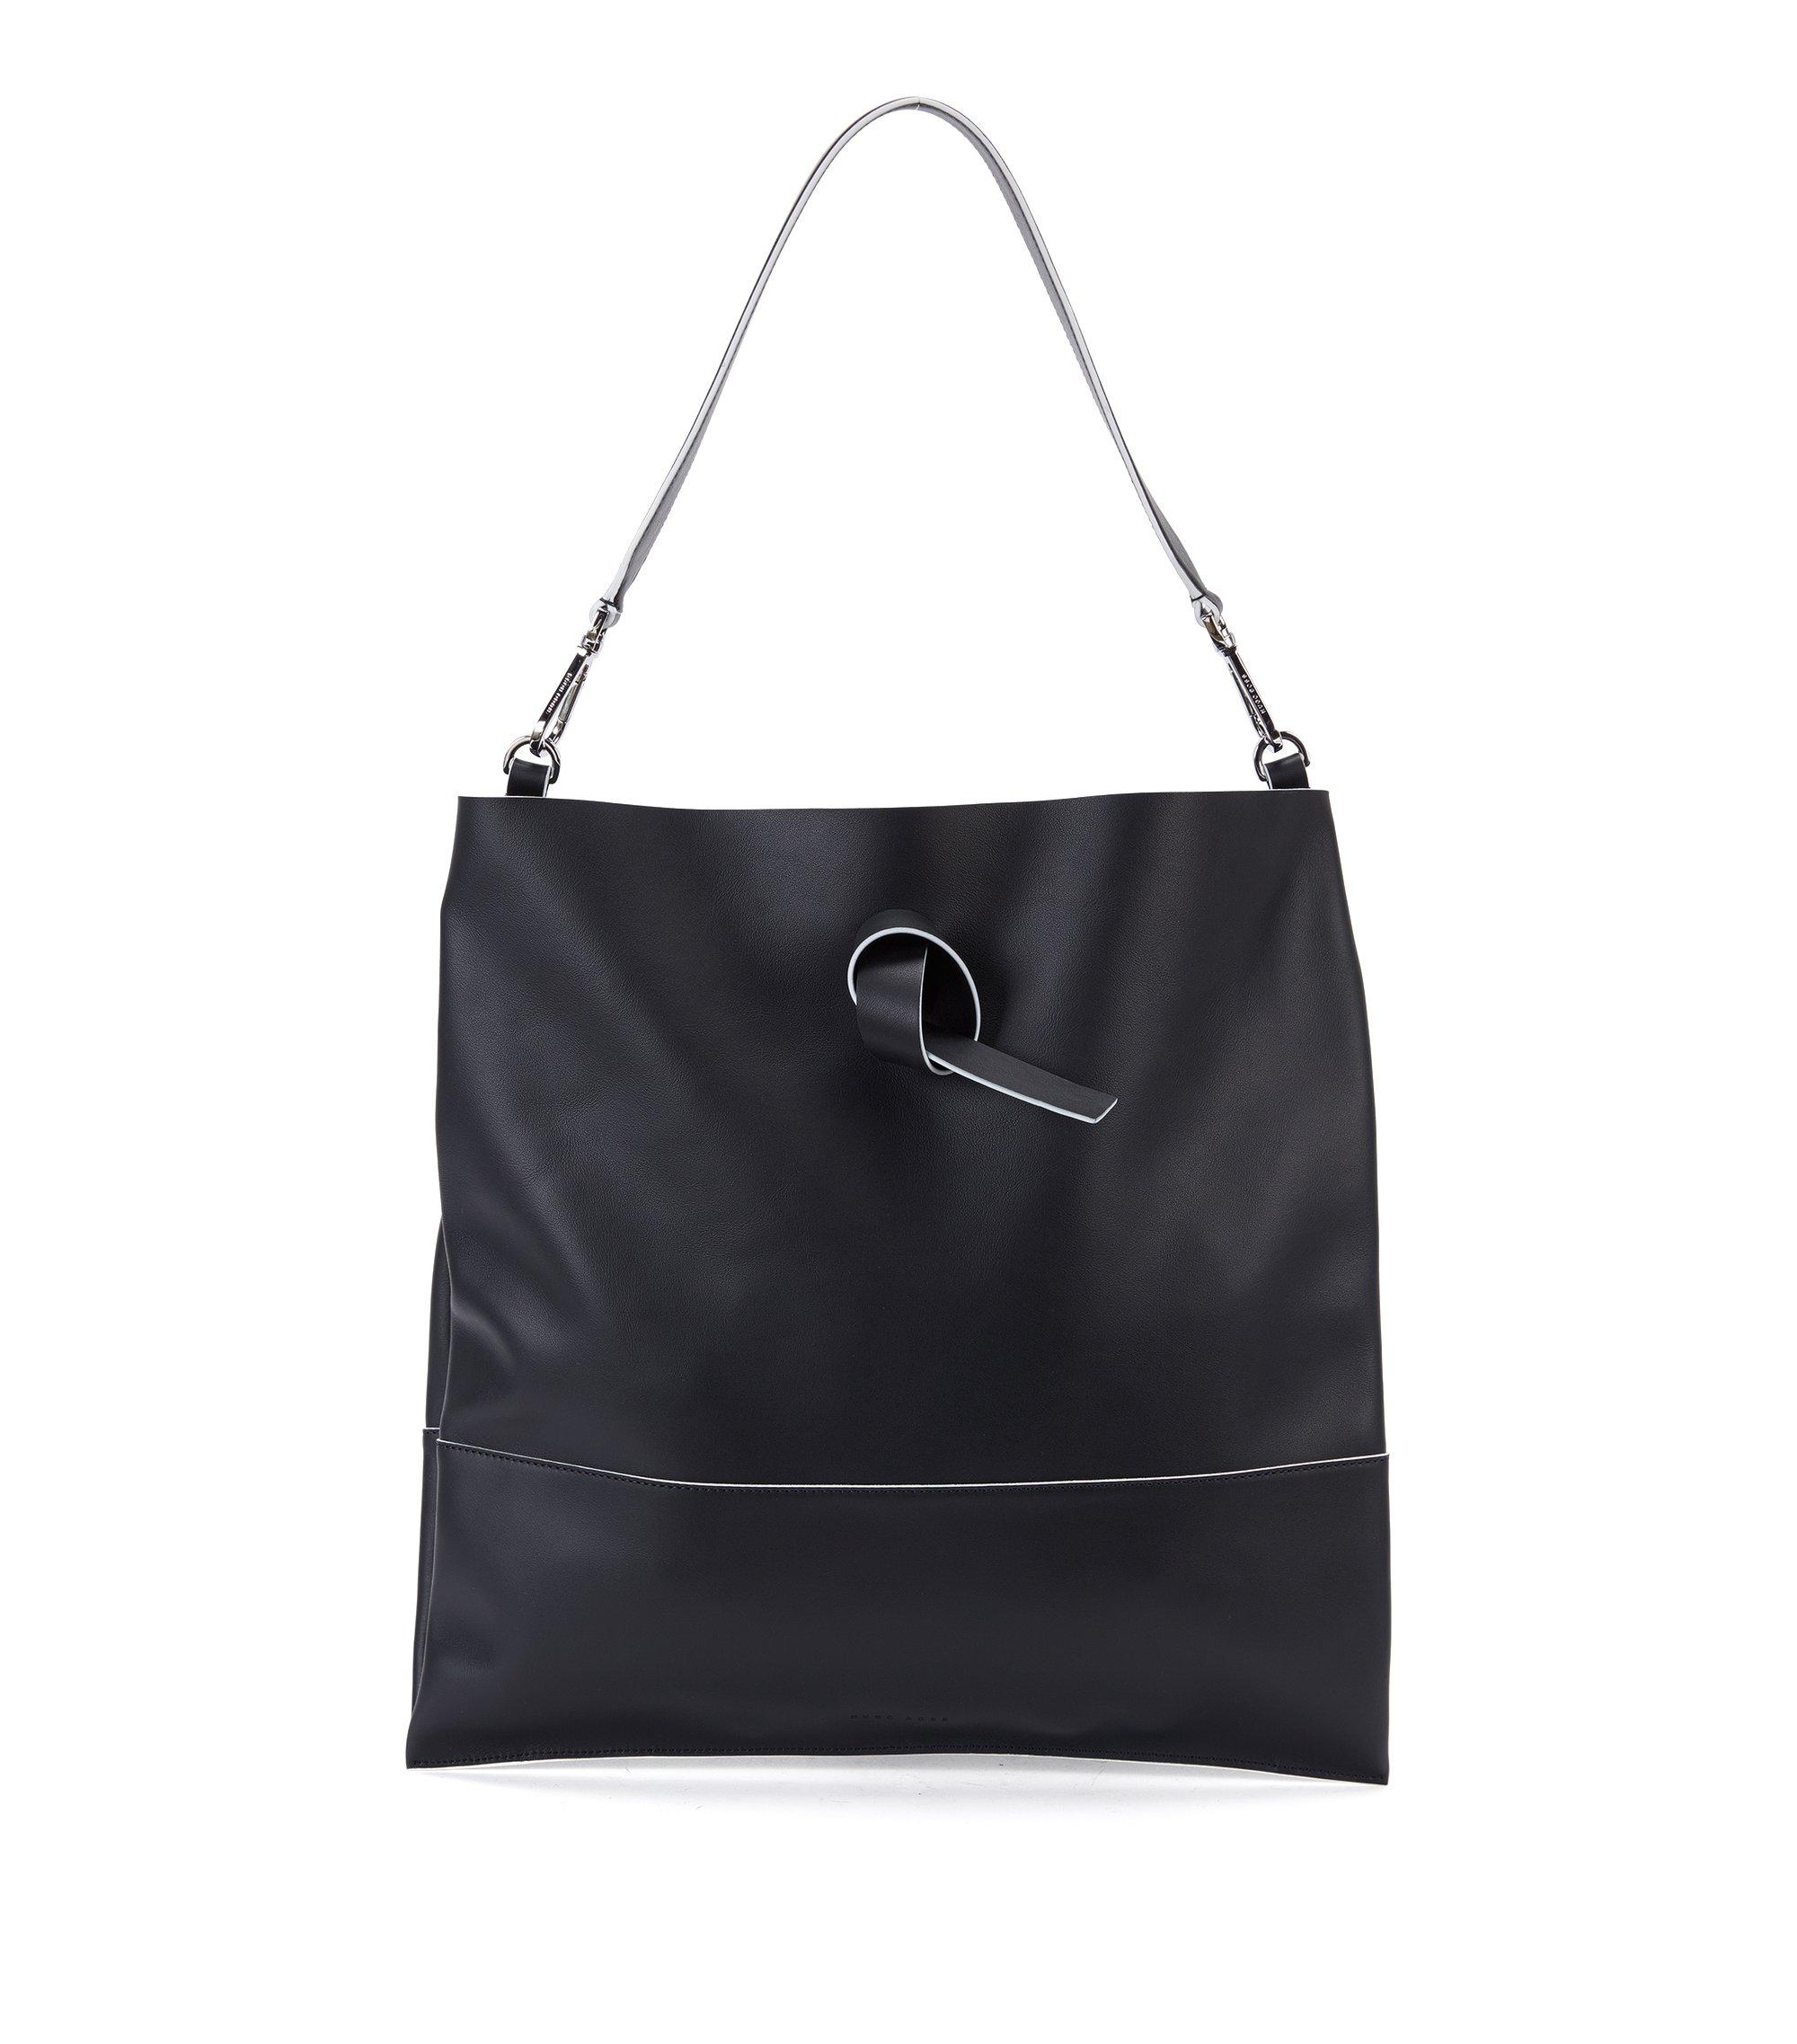 Italian Leather Handbag | Modern Day Tote, Black